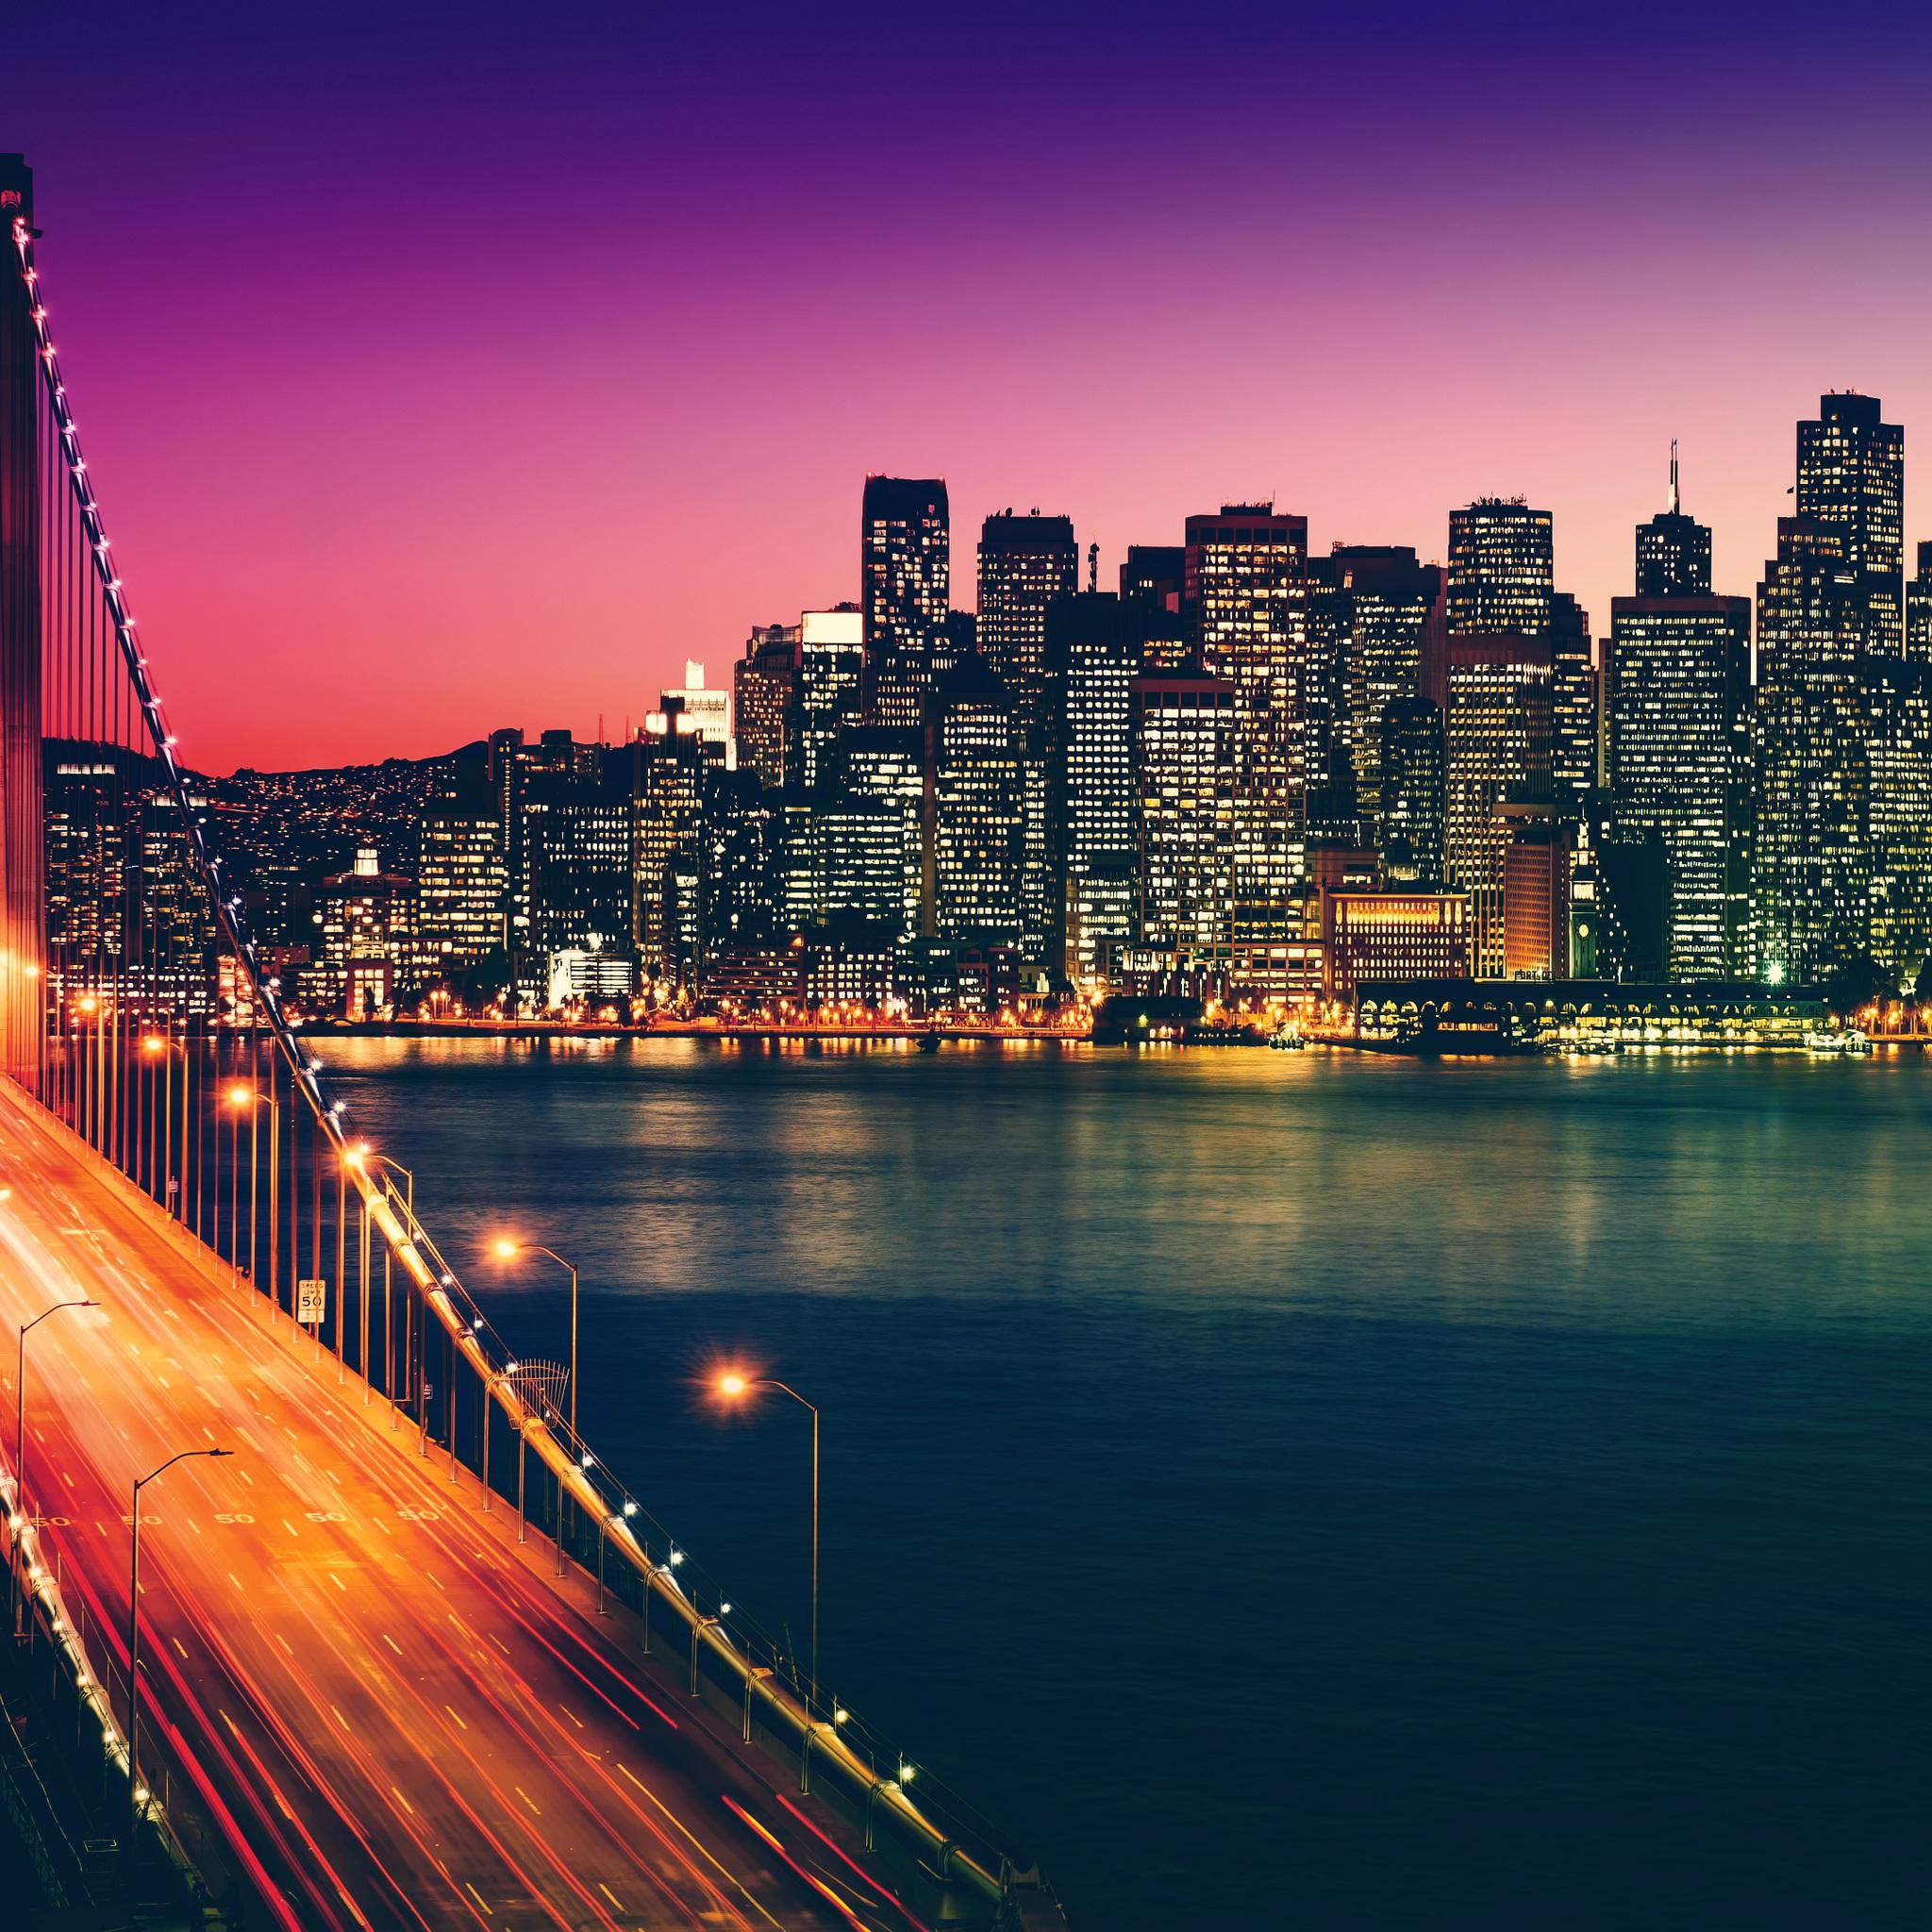 2048x2048 San Francisco California Cityscape 4k Ipad Air